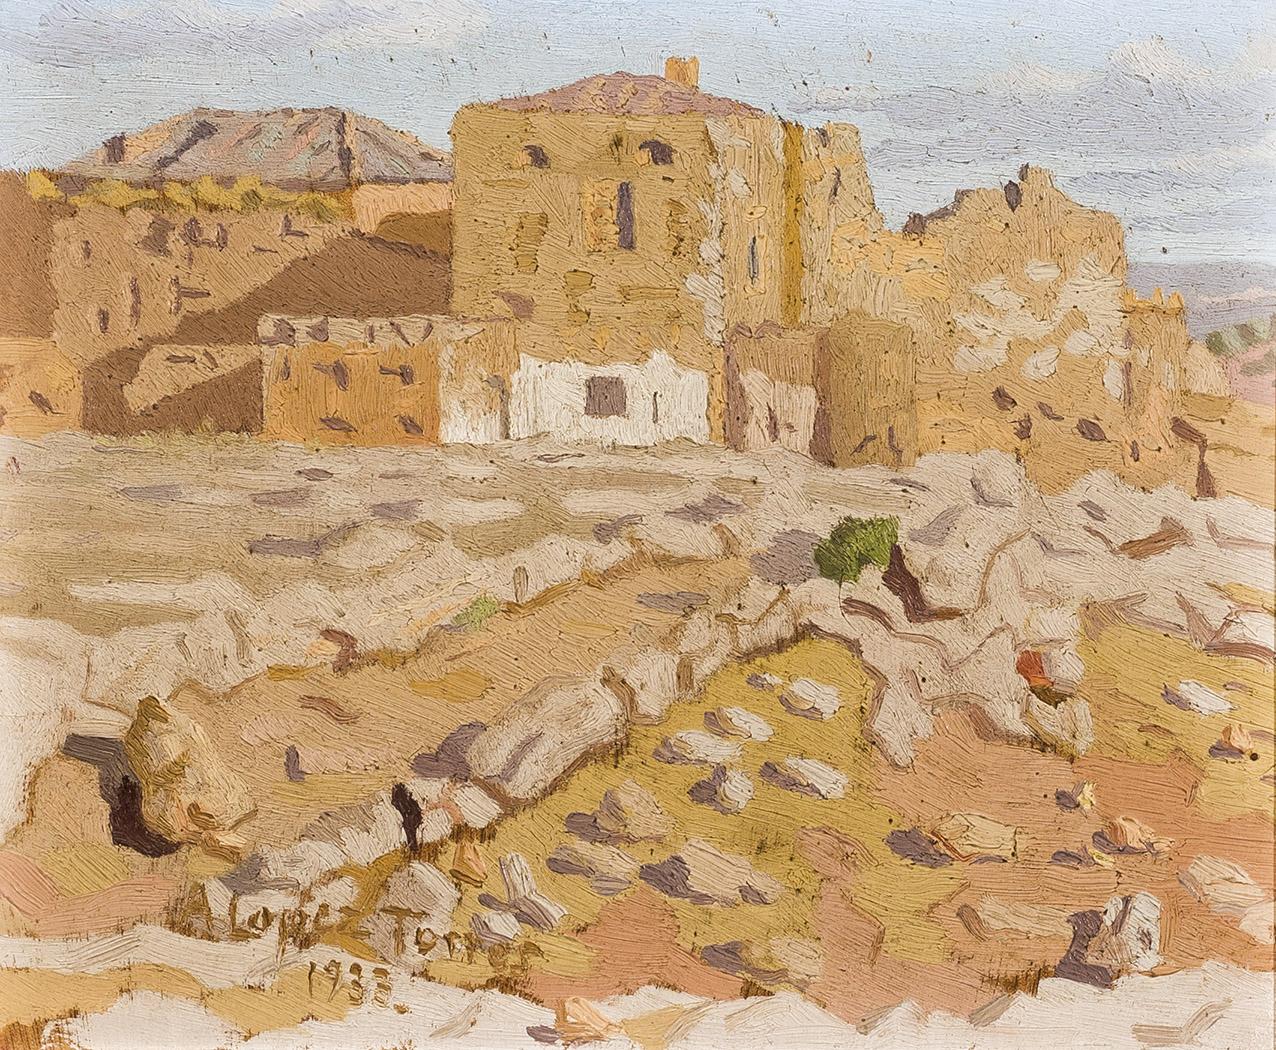 Antonio-Lopez-Torres-Paisaje-campestre-1933-1